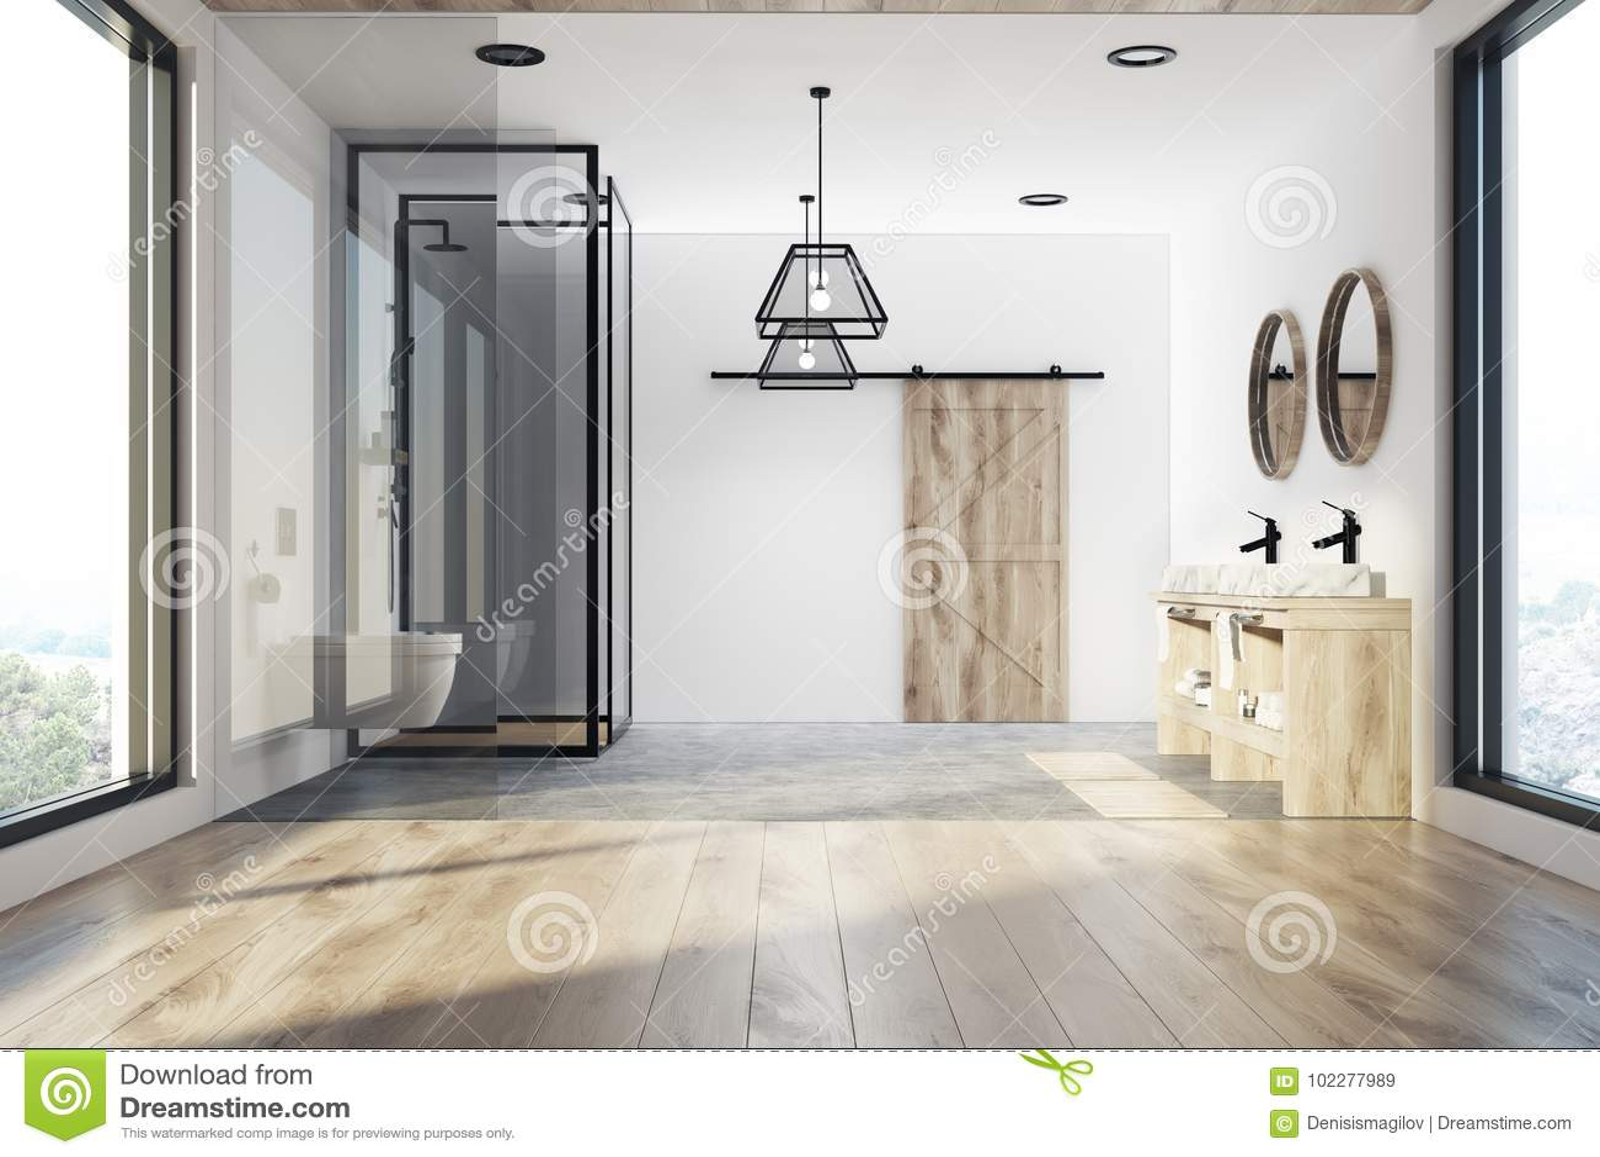 White Bathroom Tub Sink And Shower Stock Illustration